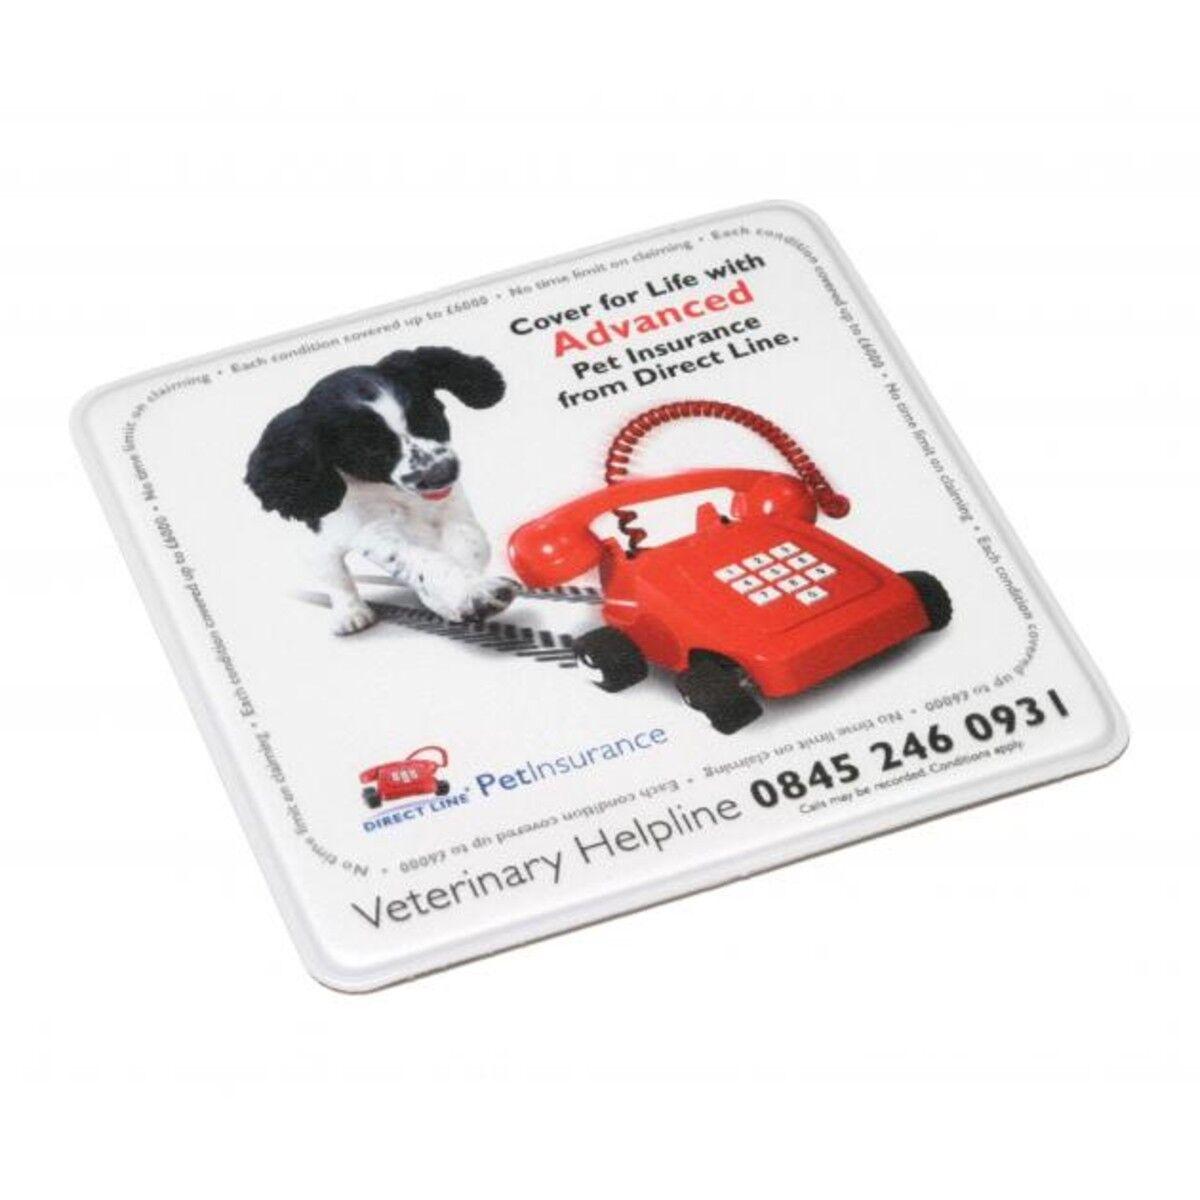 PVC Antibacterial Coaster